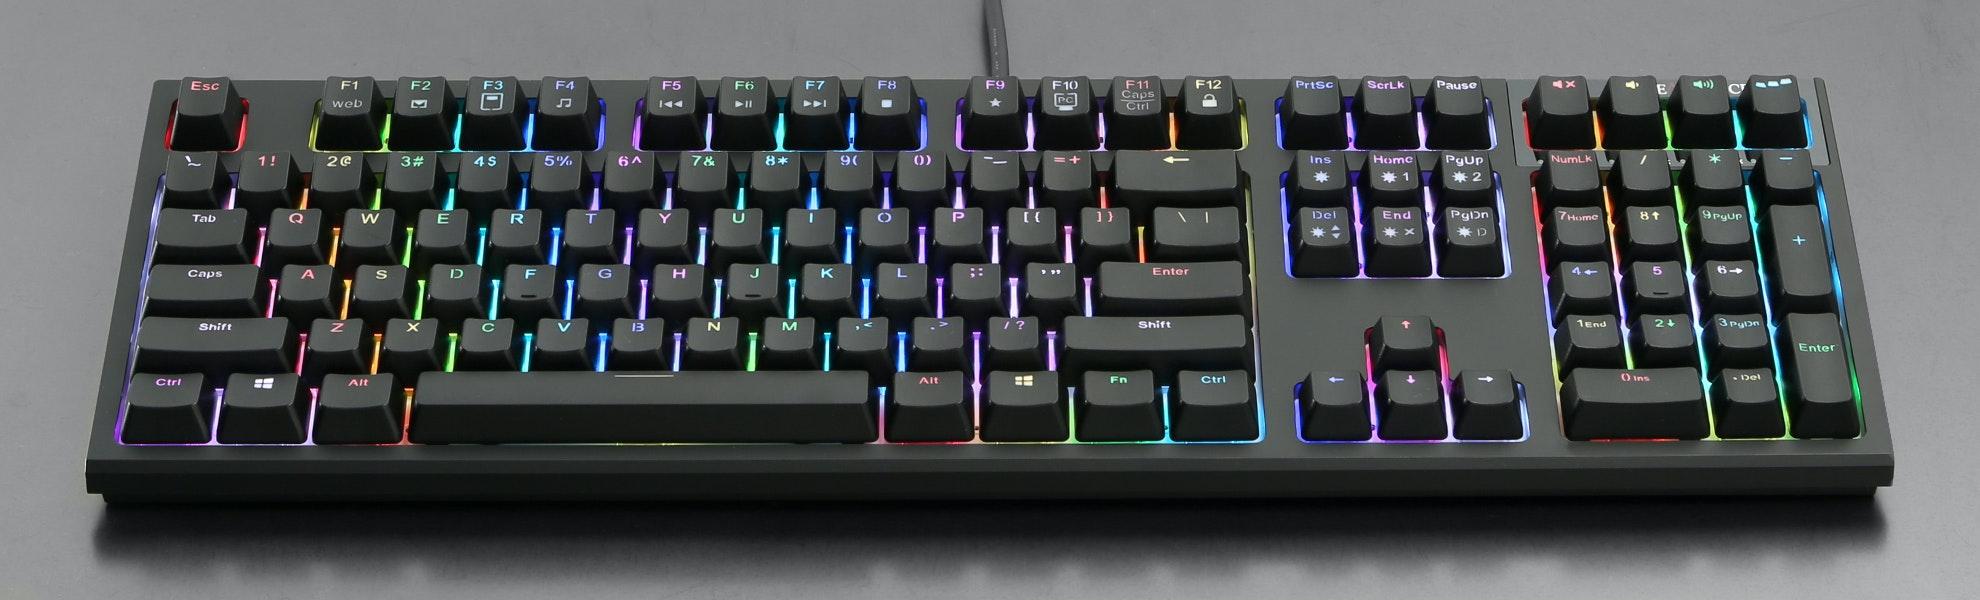 Topre Realforce RGB Mechanical Keyboard